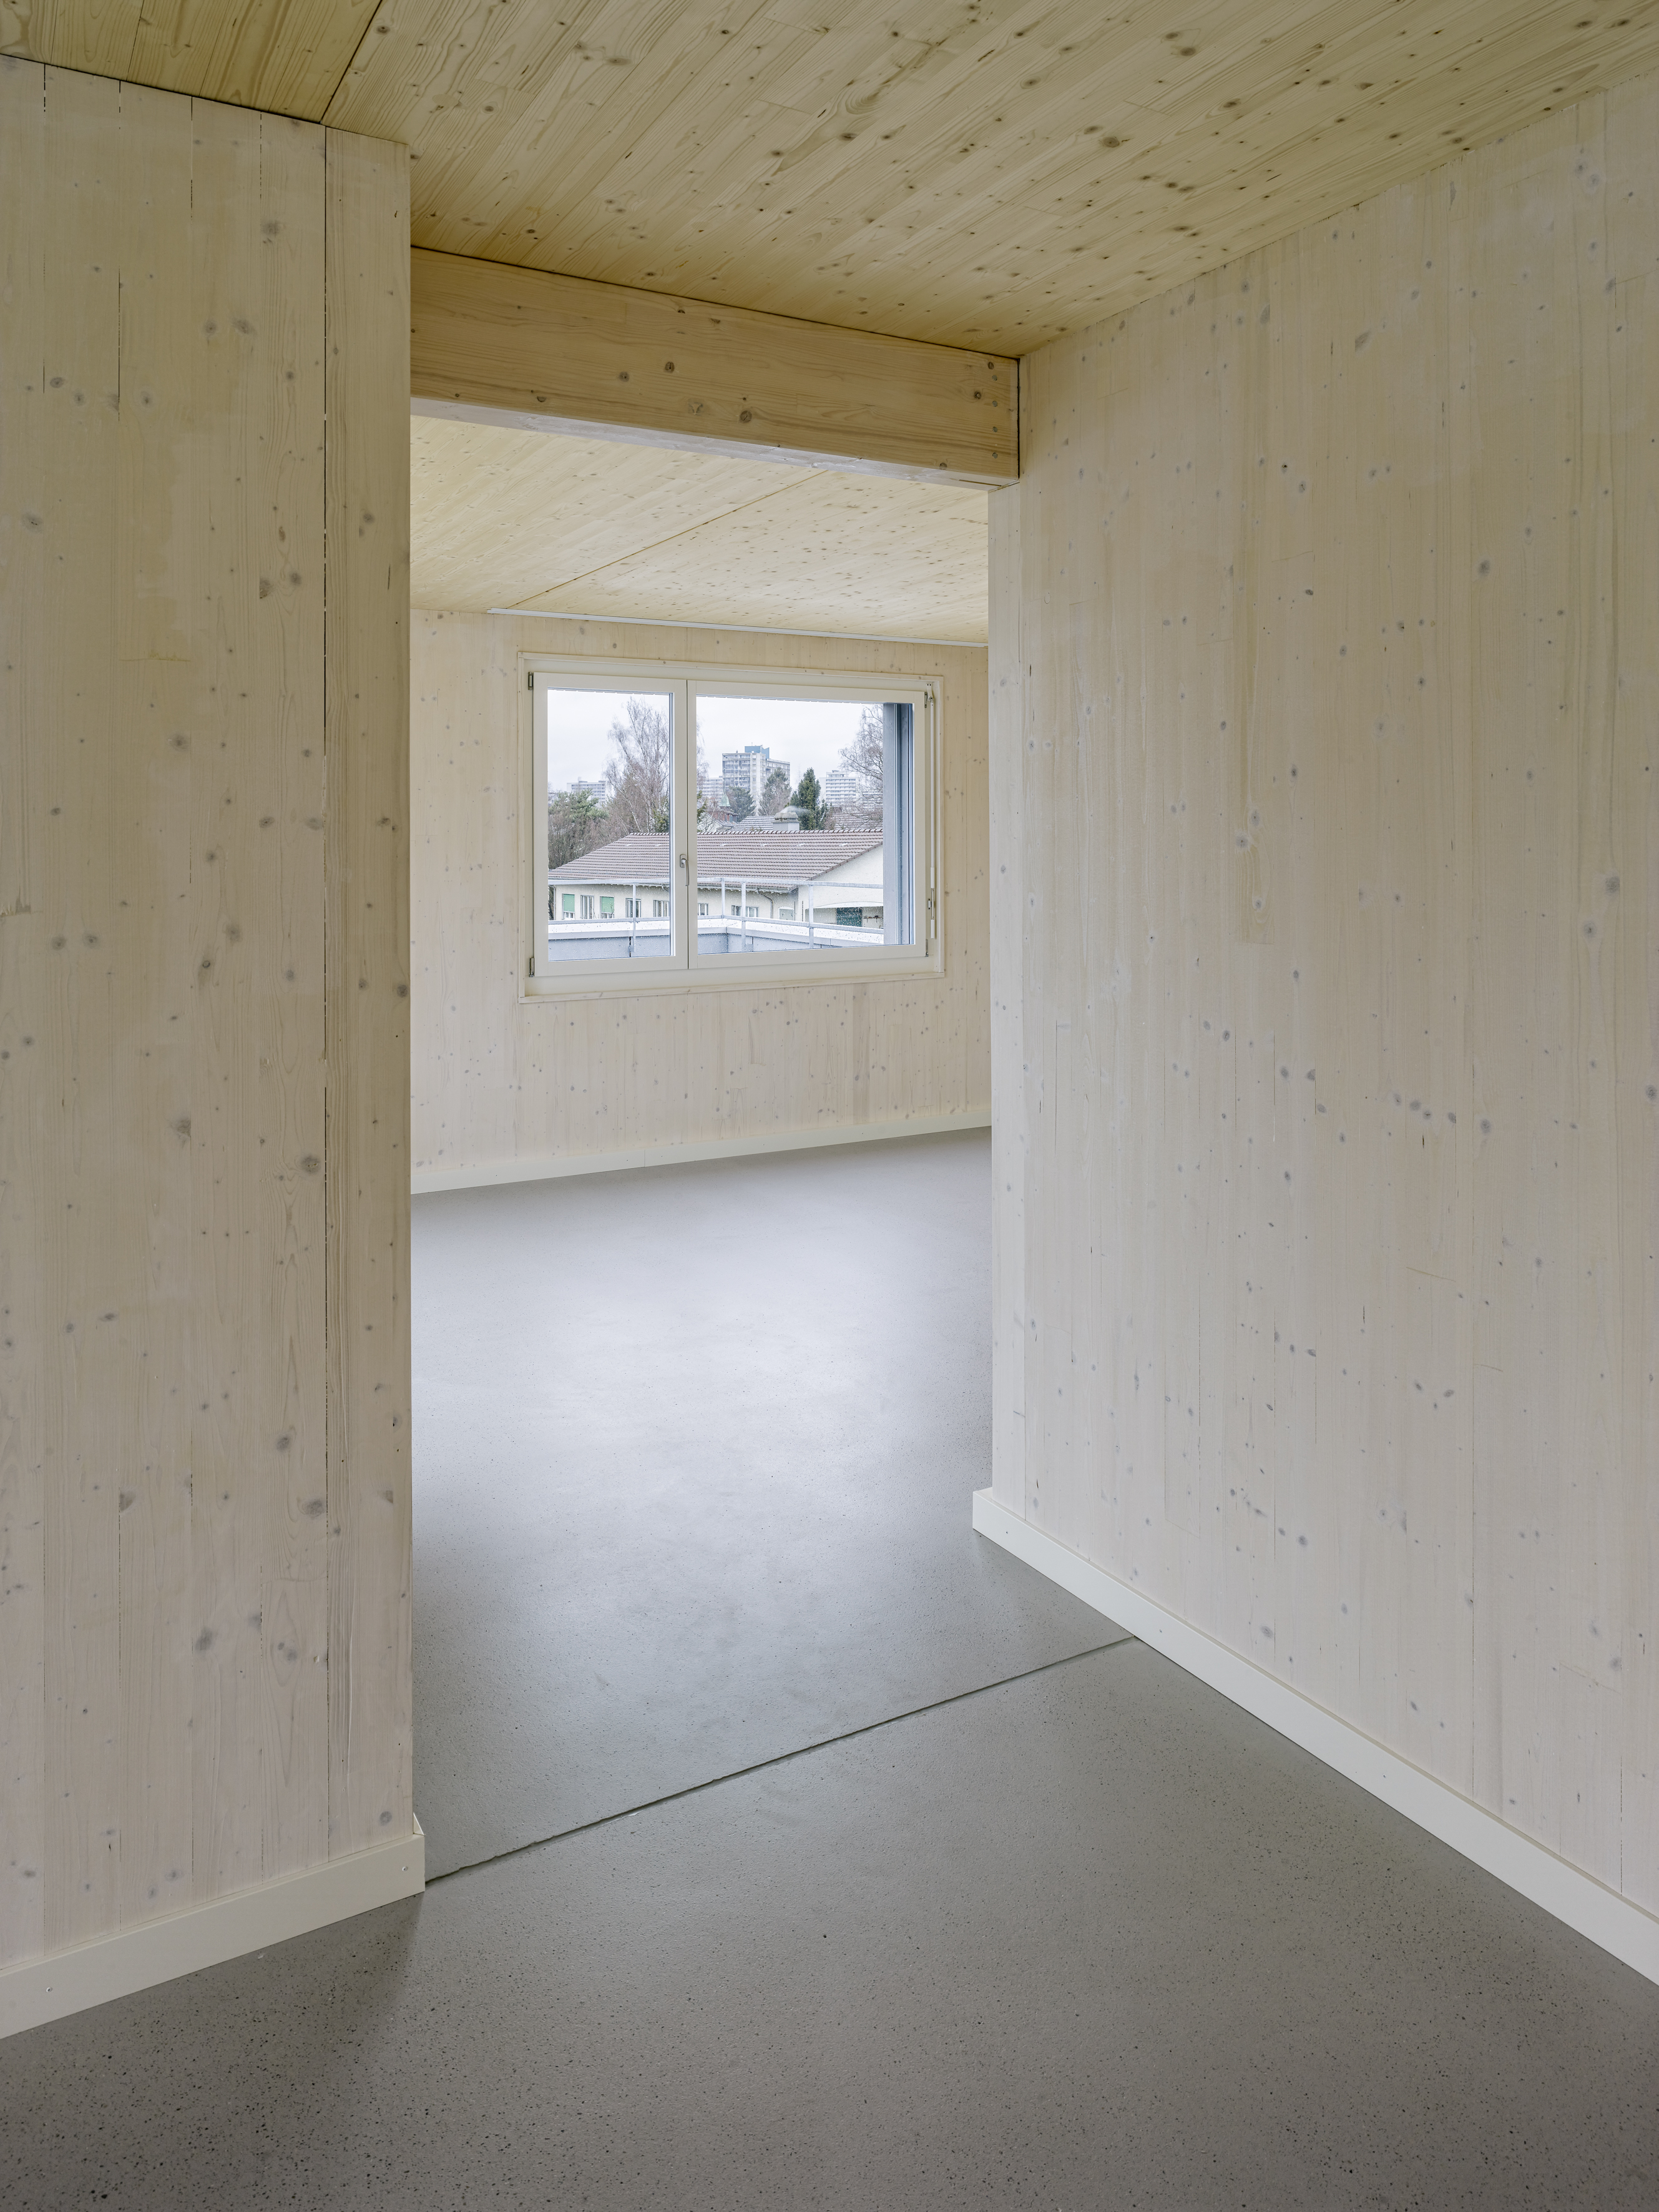 Wohnraum im diagonalen Dialog